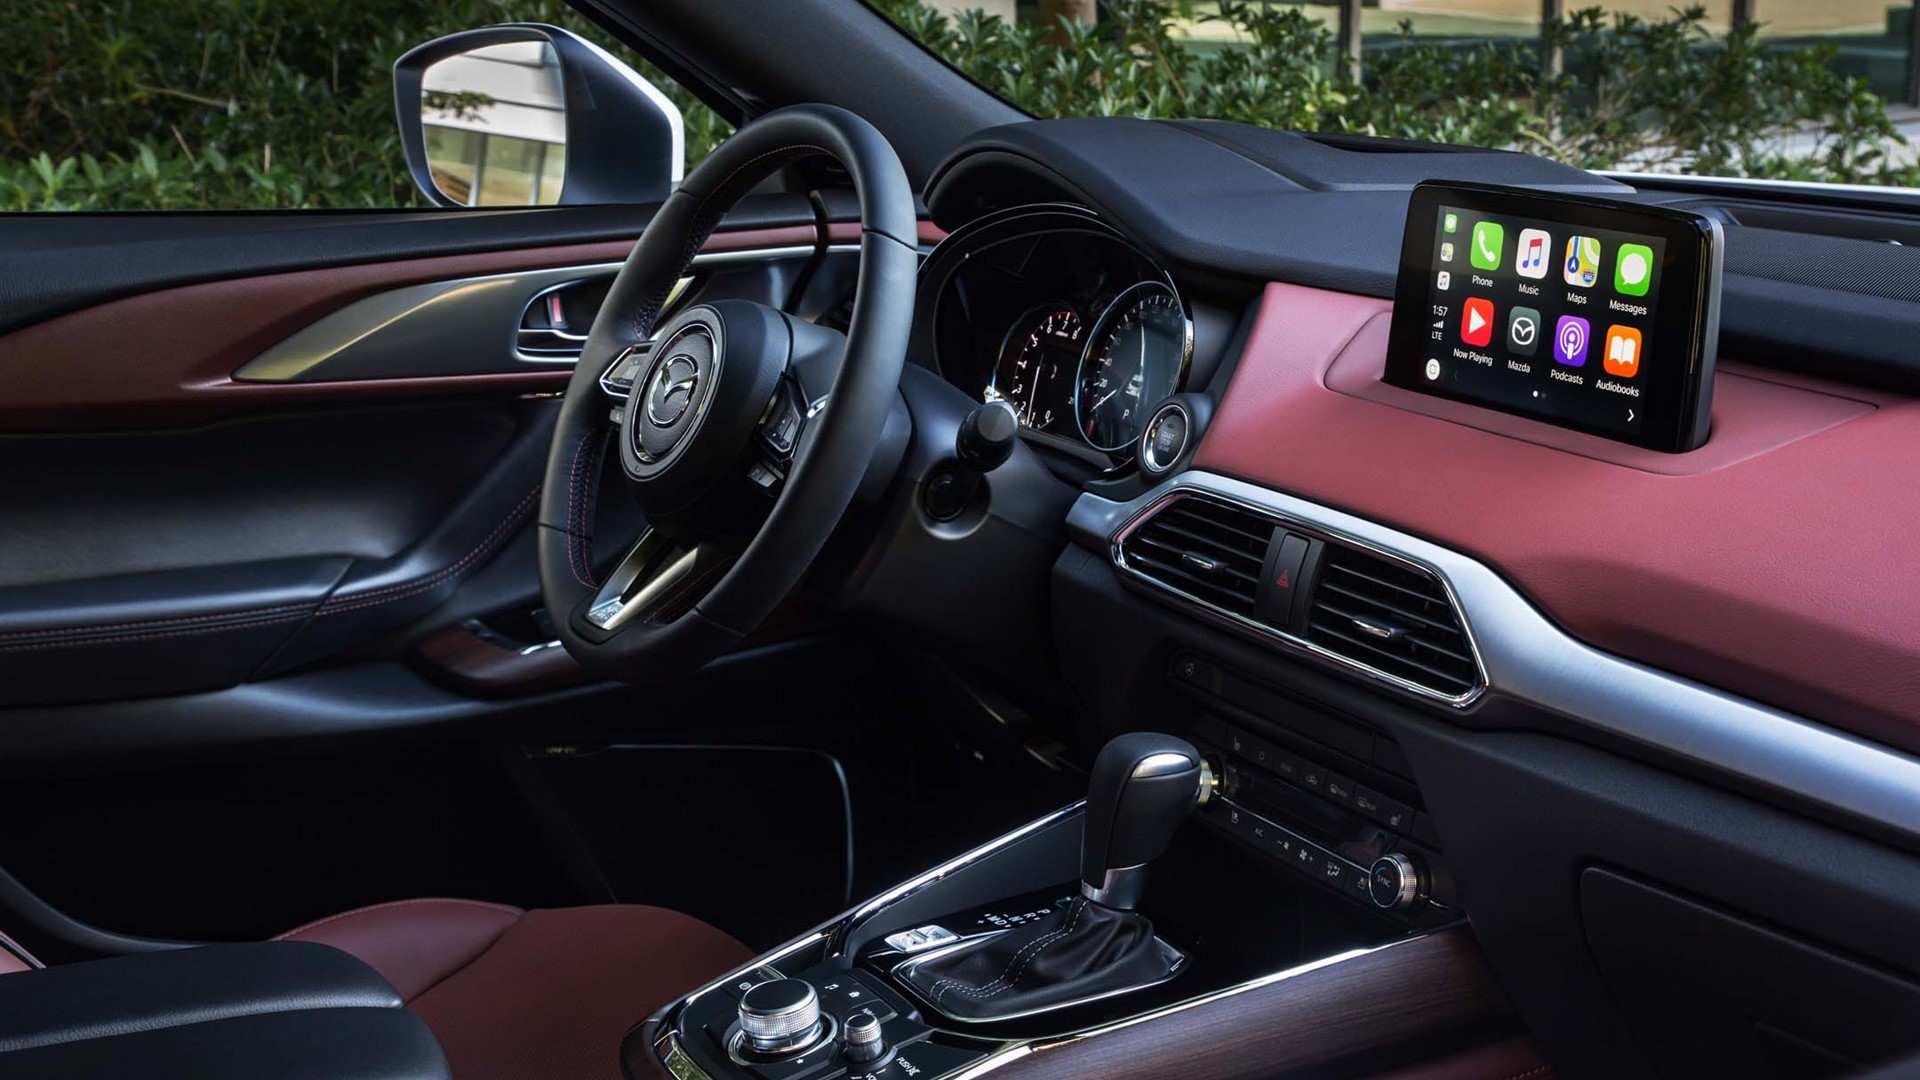 40 Concept of Mazda 2020 Apple Carplay Review for Mazda 2020 Apple Carplay